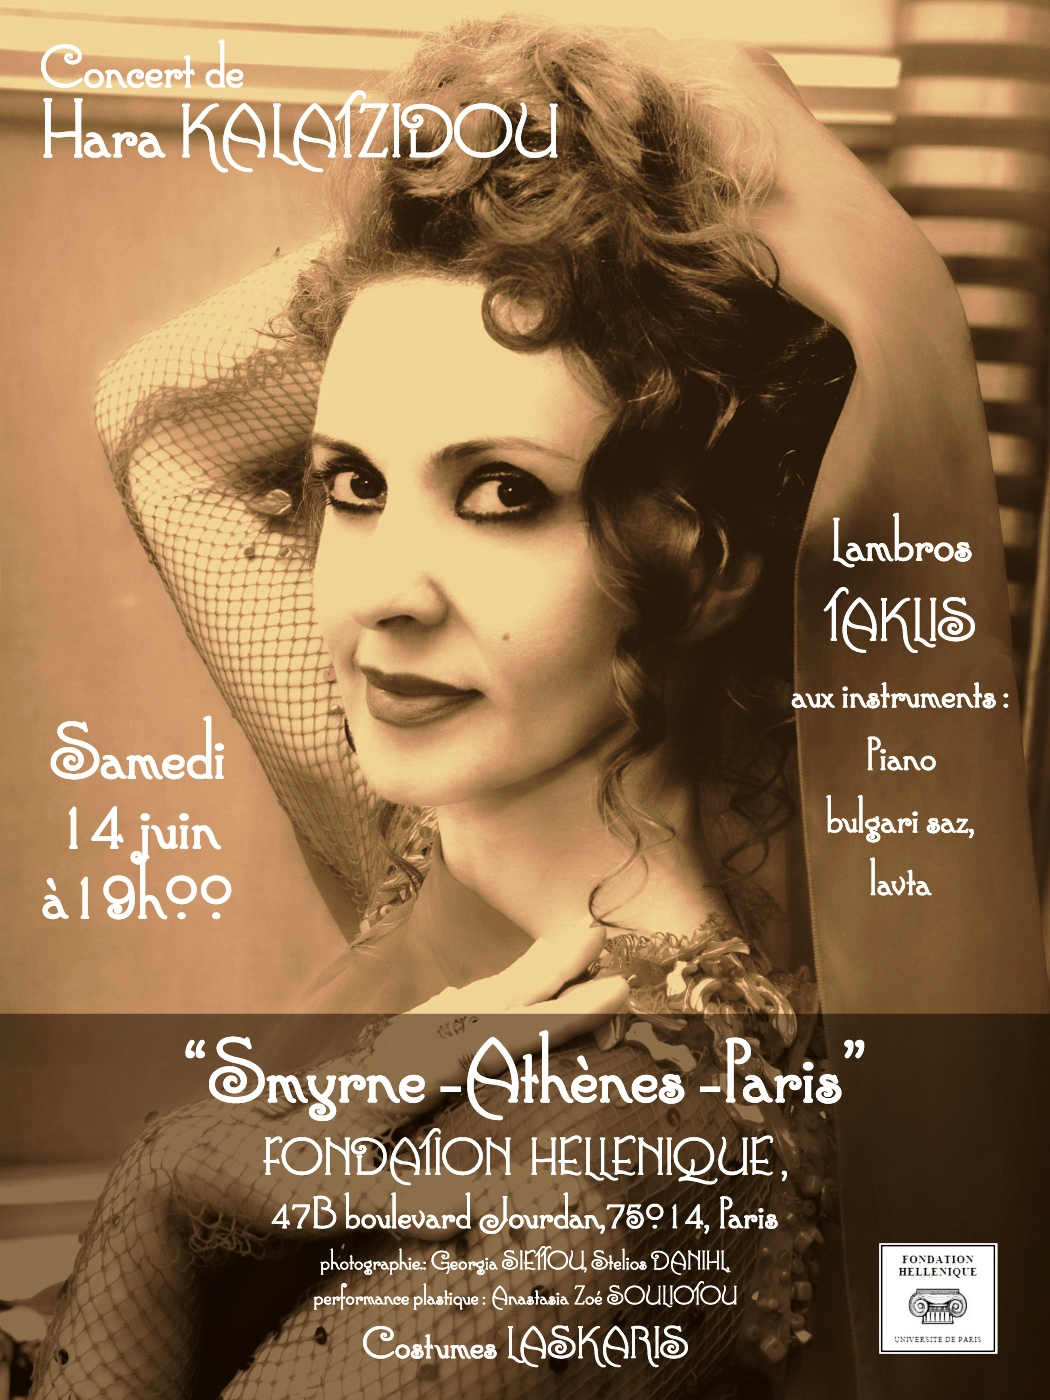 Concert InvitationConcert « Smyrne-Athènes-Paris » 14 juin 2014